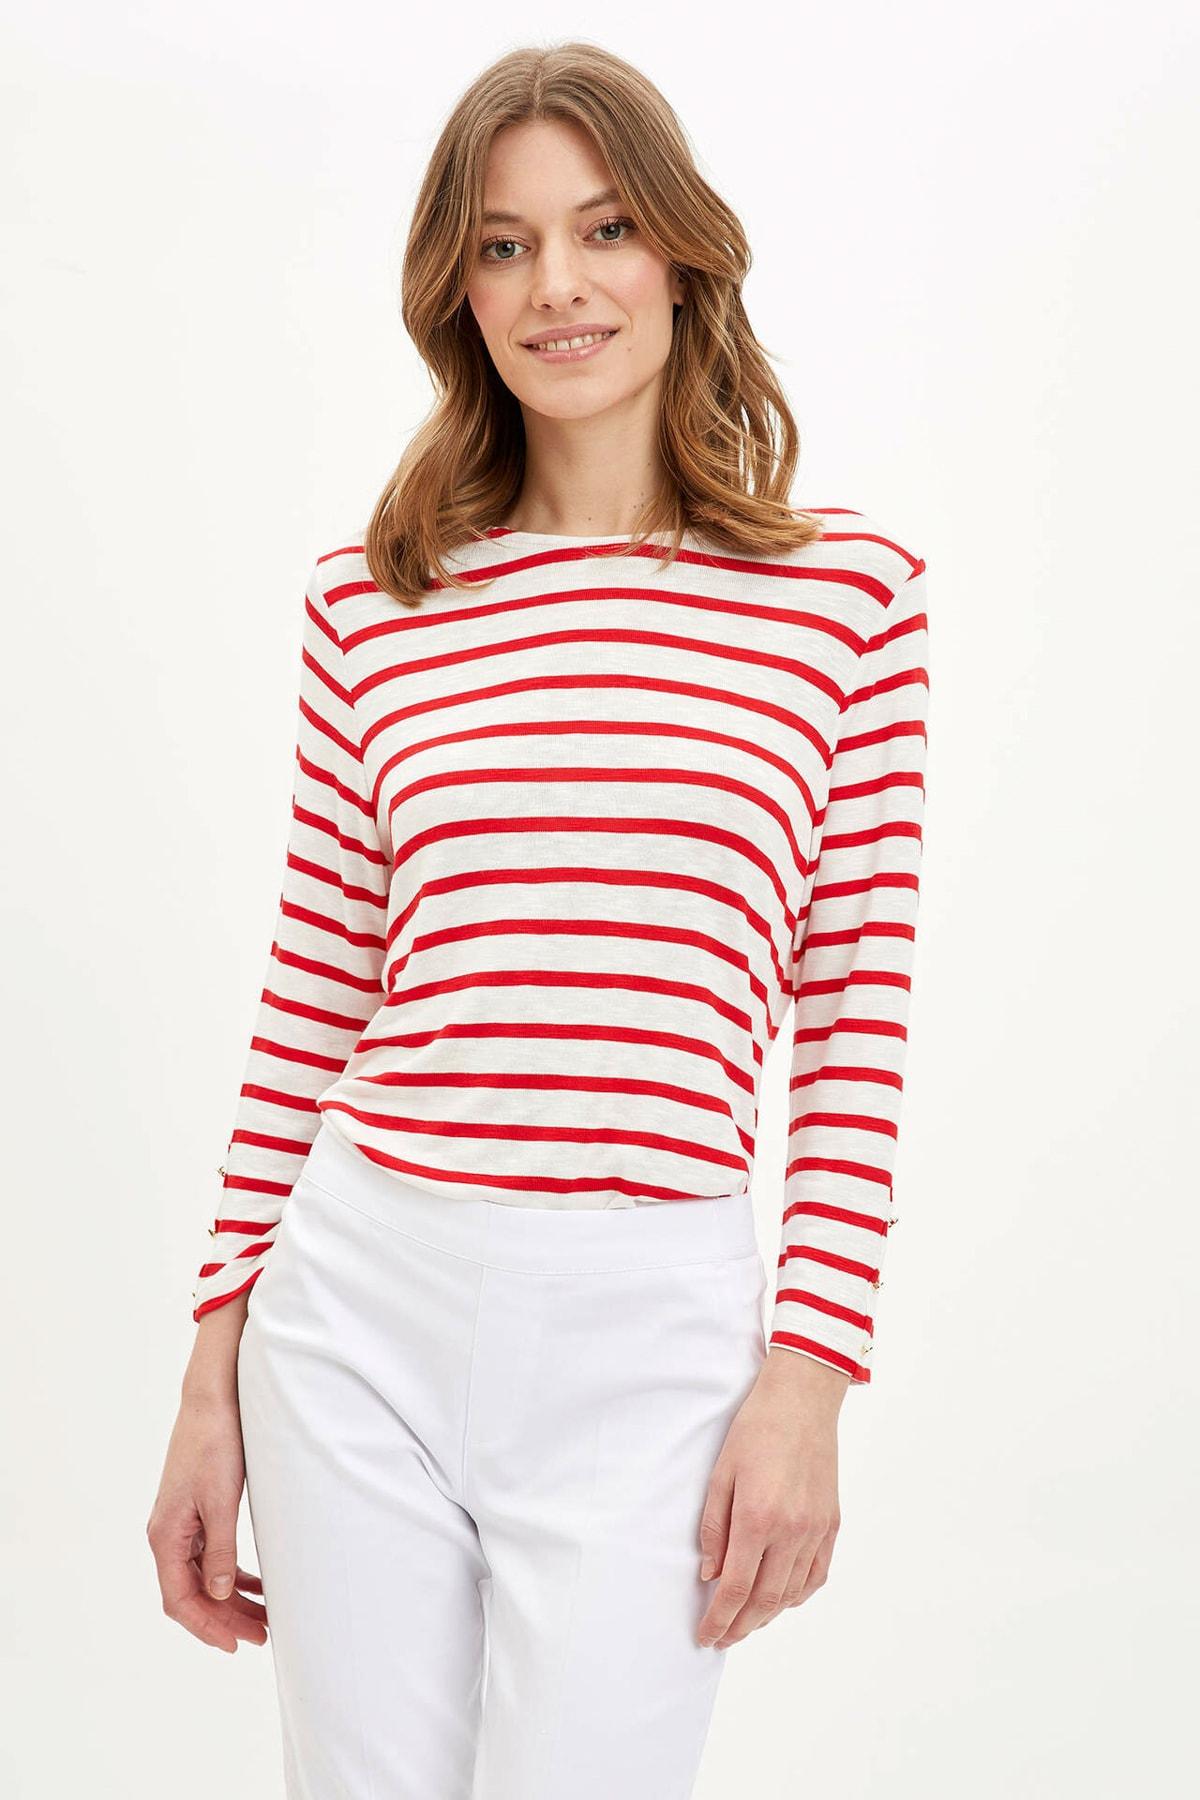 DeFacto Kadın Kırmızı Çizgili Uzun Kollu T-Shirt R3672AZ.20SP.RD227 1